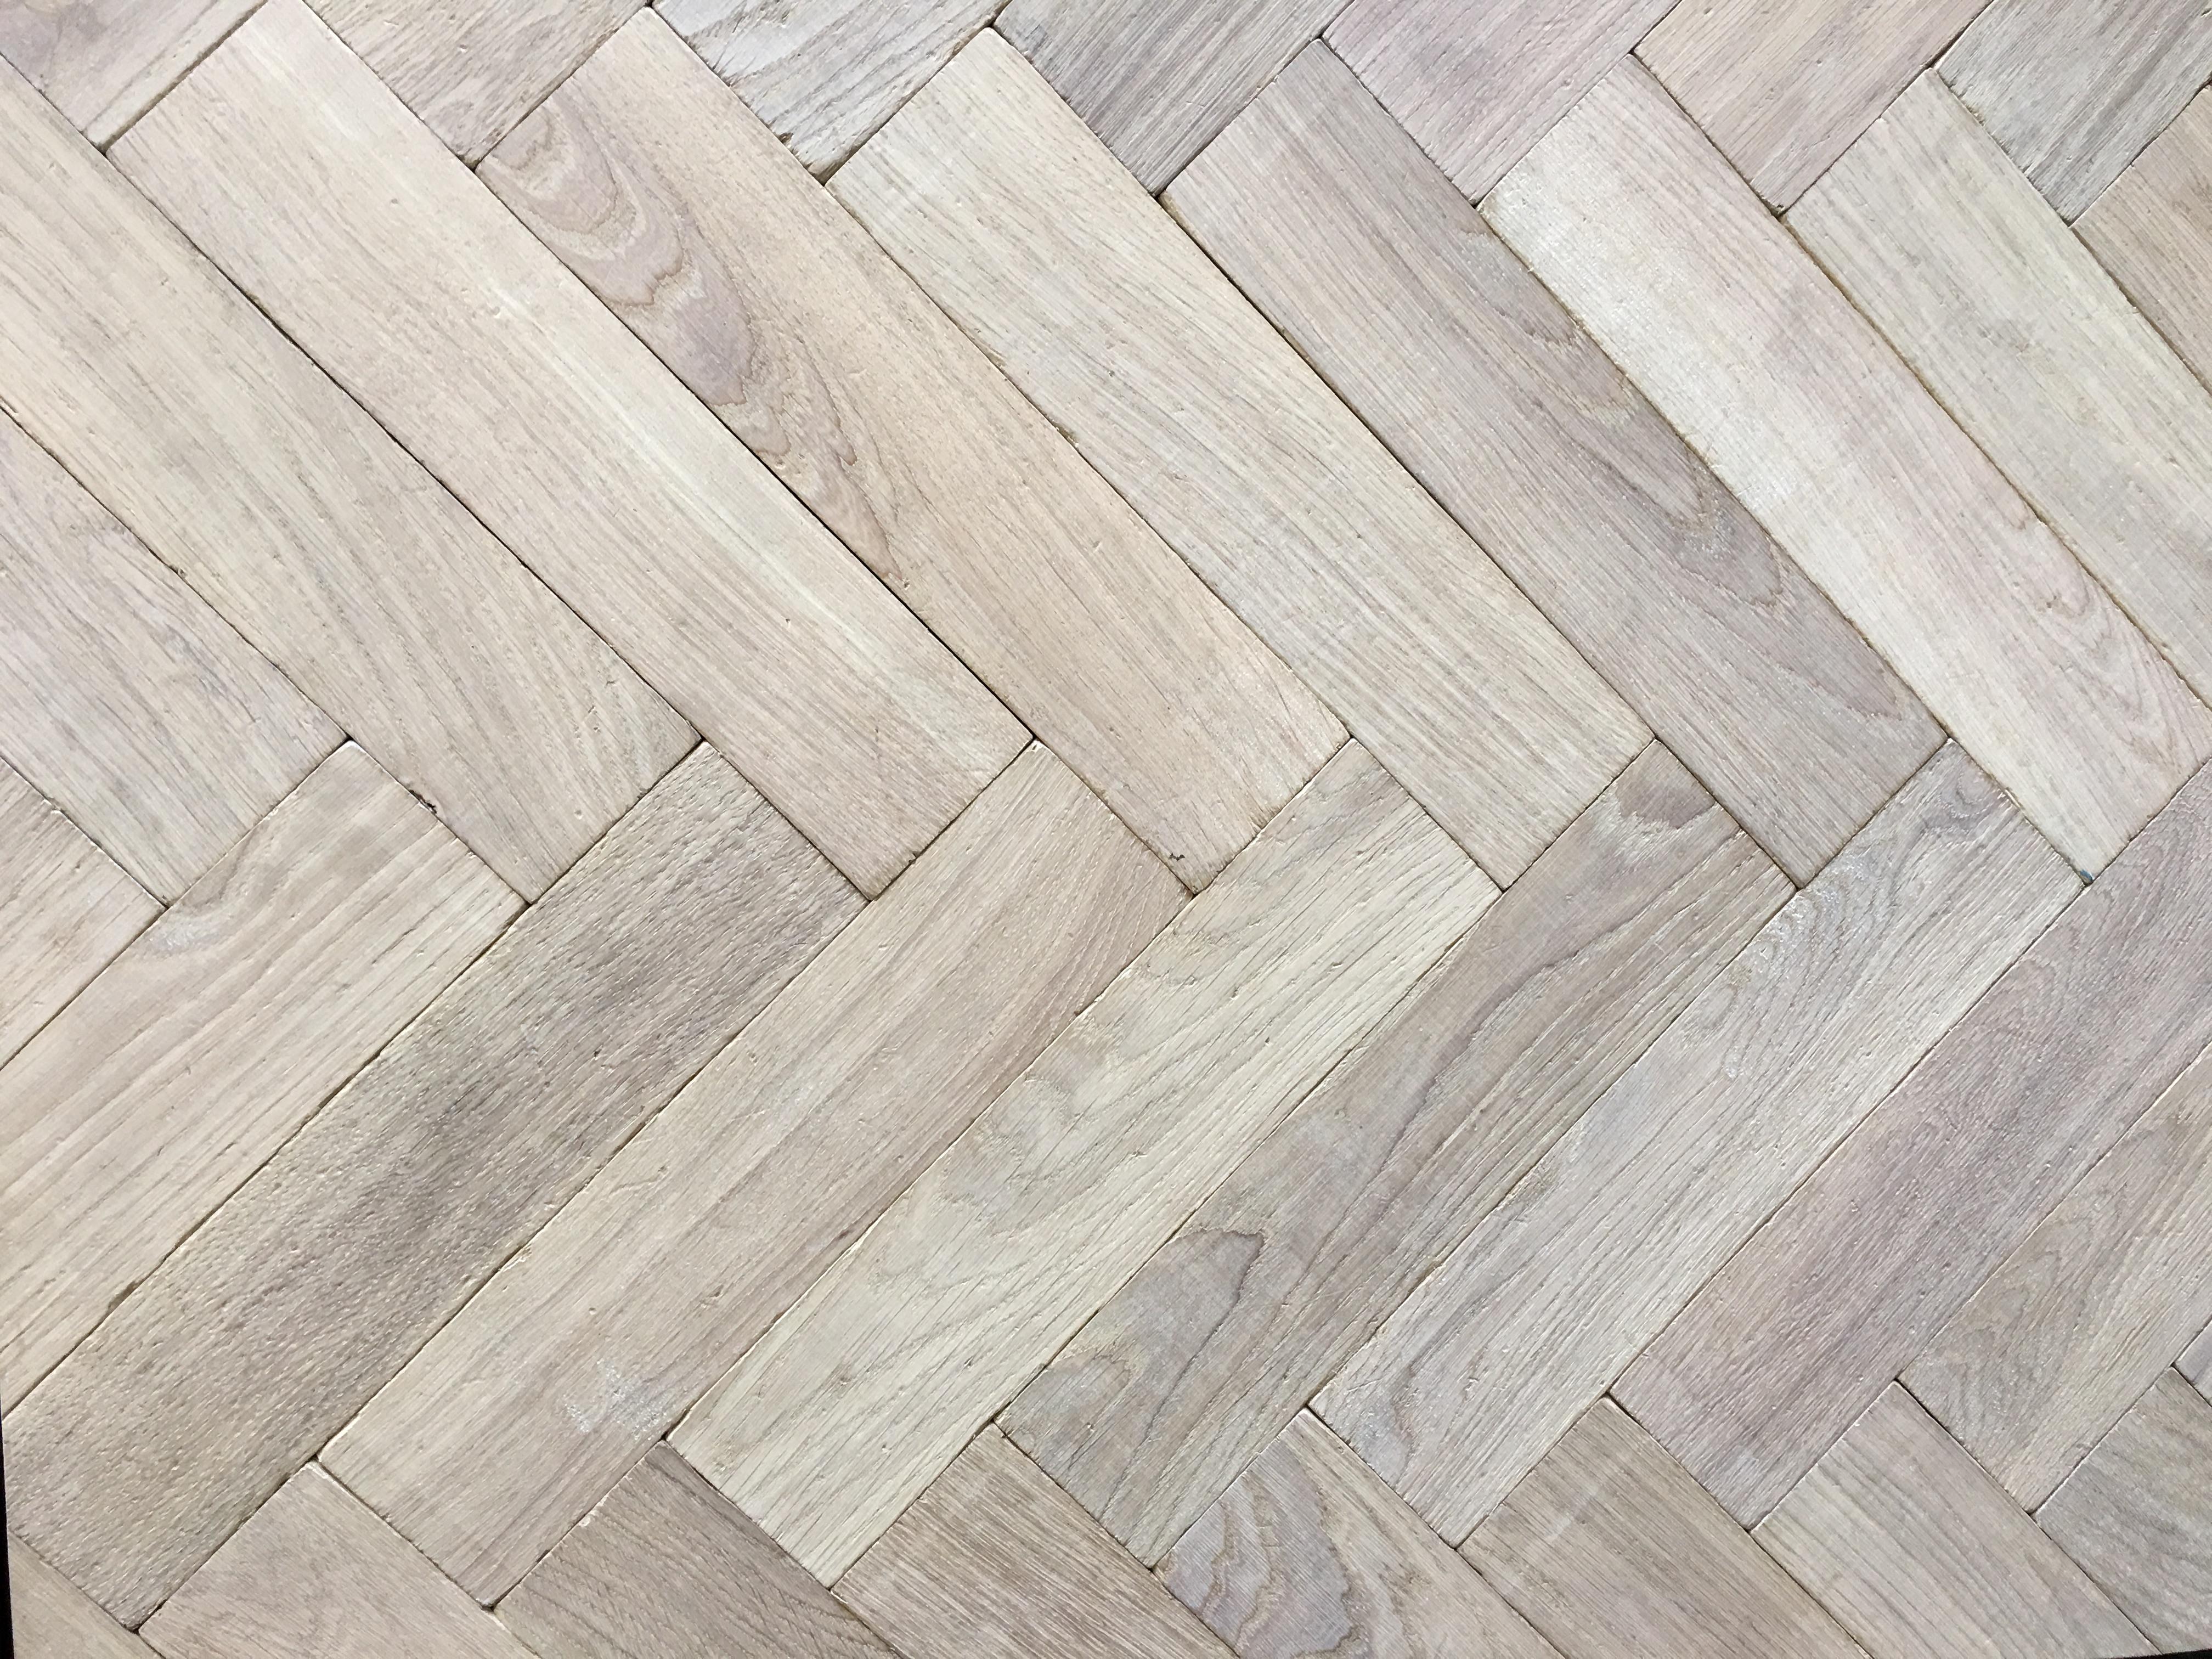 Traditional White Oak European Herringbone Panels Parquet Flooring Solid Wood Por Uk Based